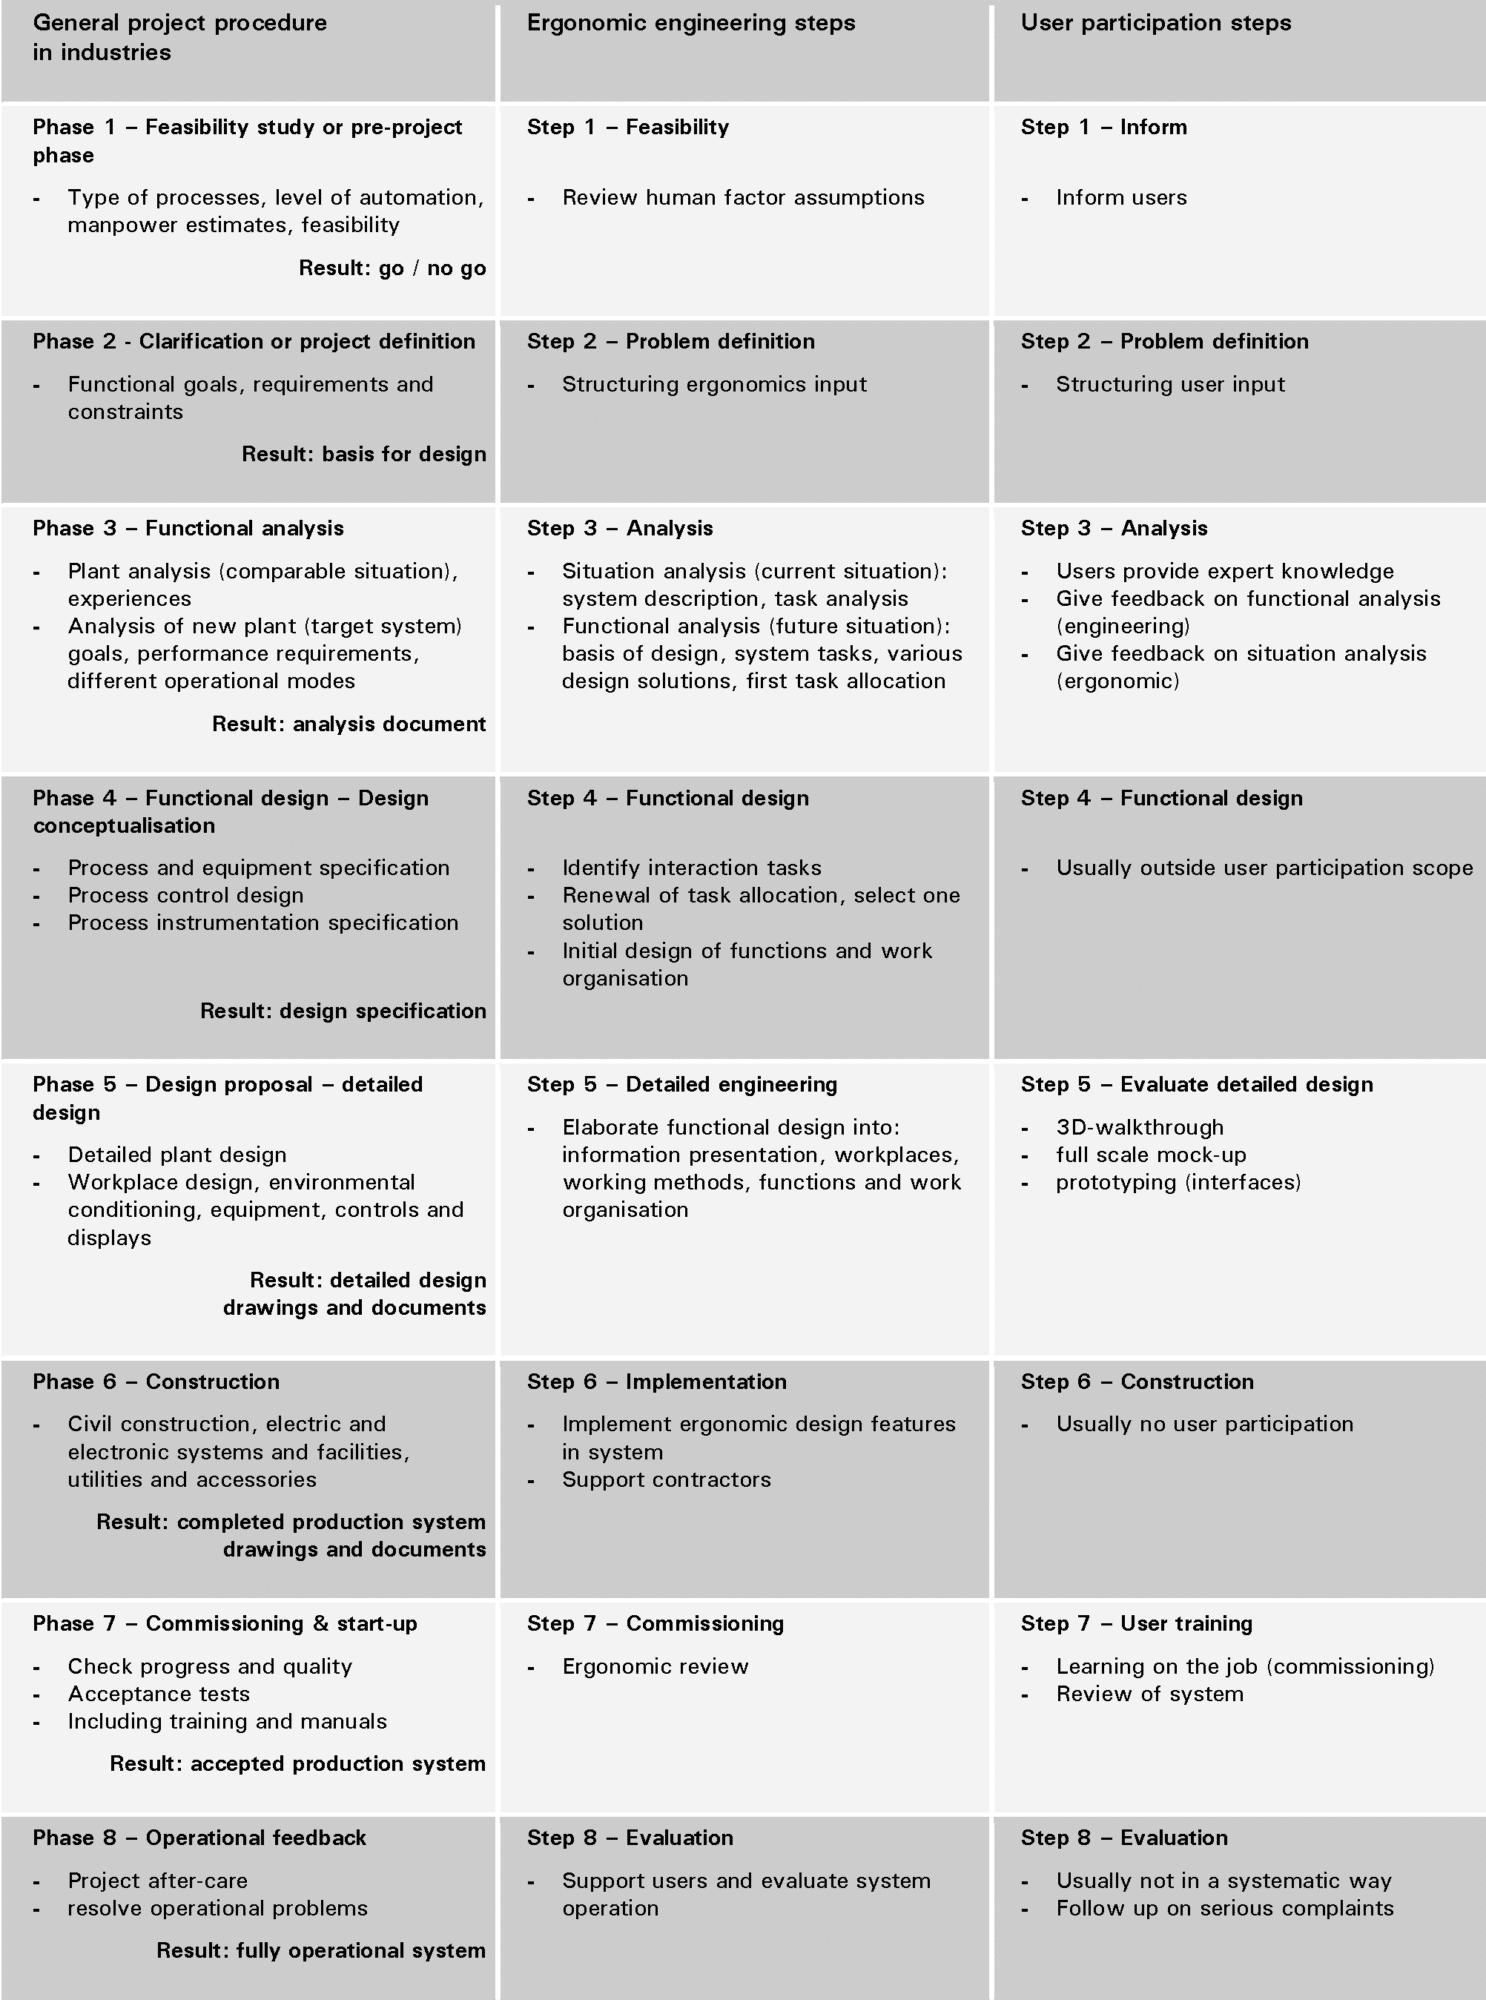 figure-1-overview-erg-appr